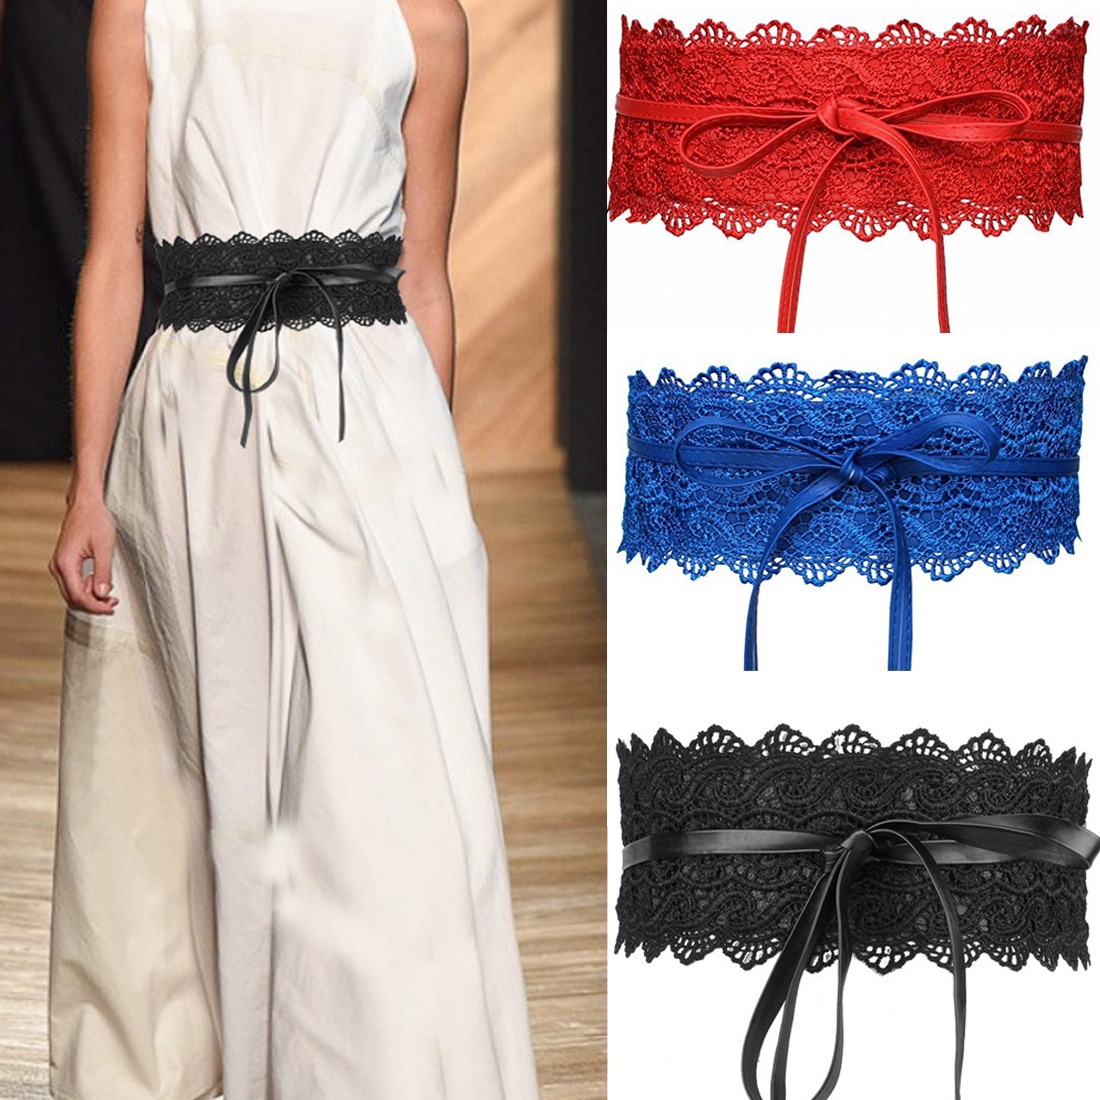 Fashion Women Dress Bowknot Soft Faux Leather Lace Wide Decor Belt Female Bowknot Weaving Belt Boho  Wide Floral Tie Waist Band